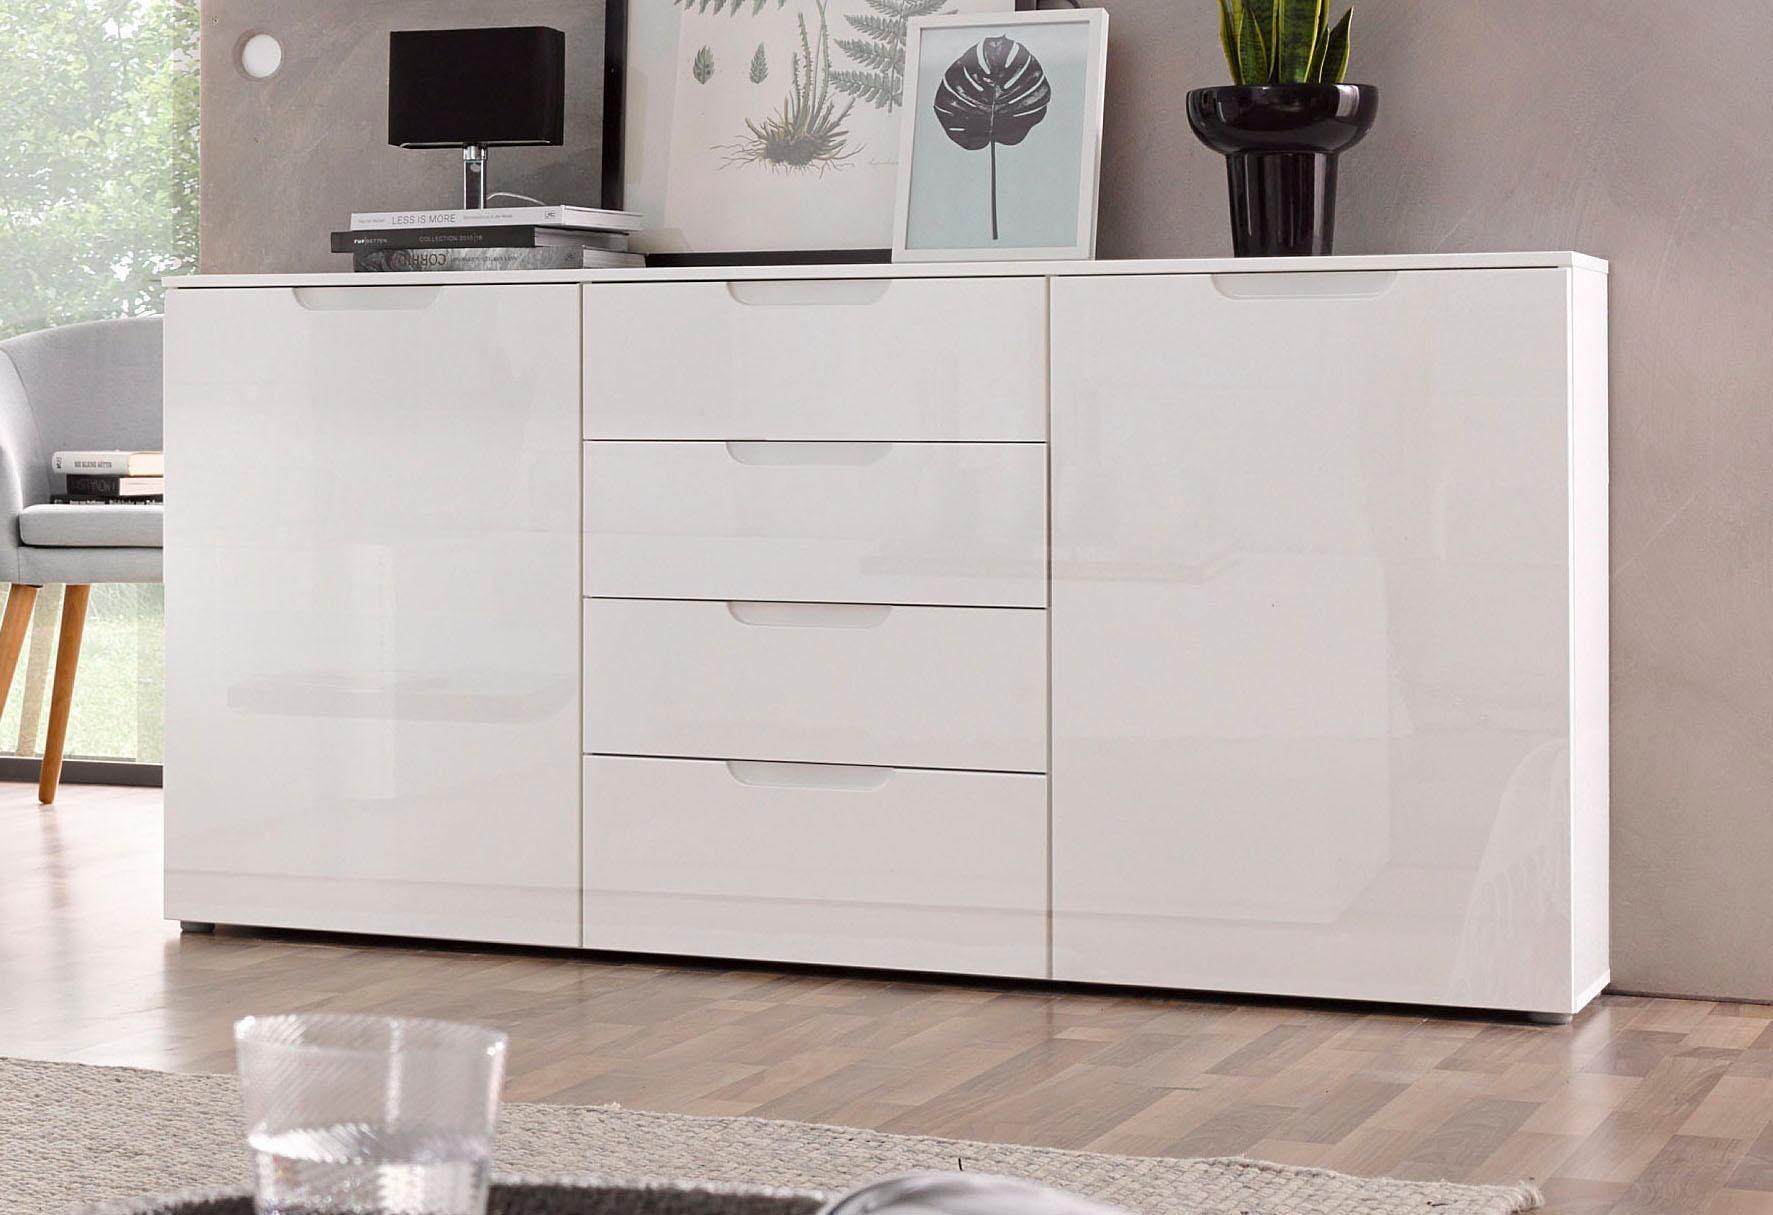 FORTE Sideboard Breite 164 6 cm